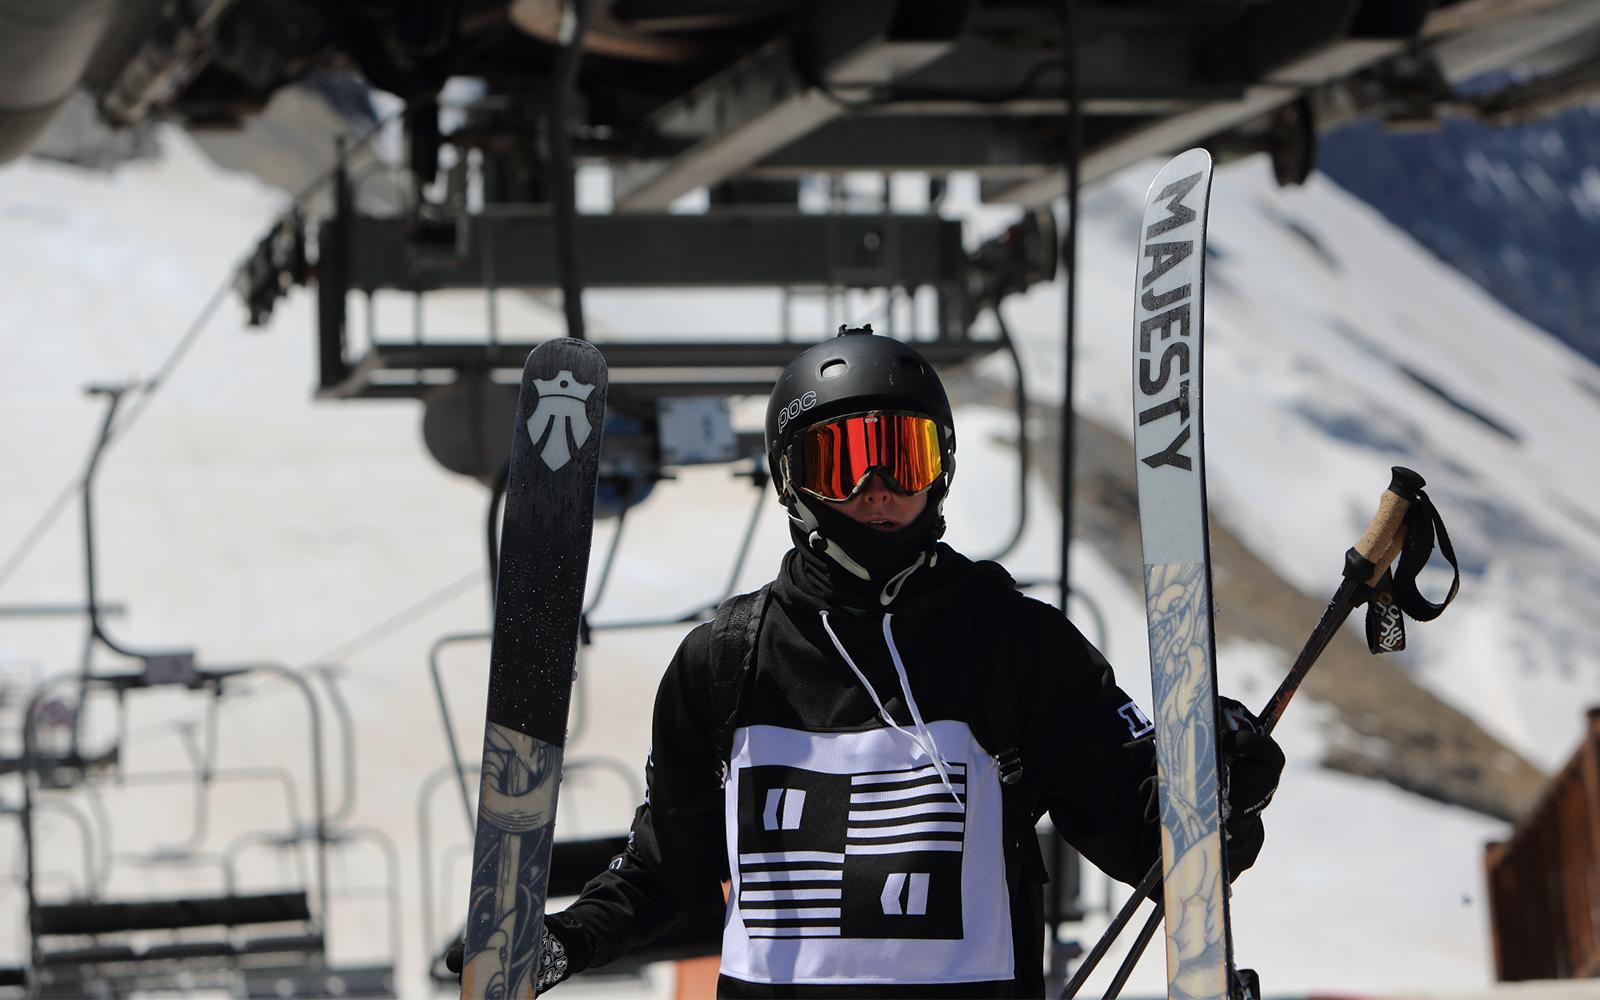 Israel Startup Wants To Revolutionize Ski Vacations